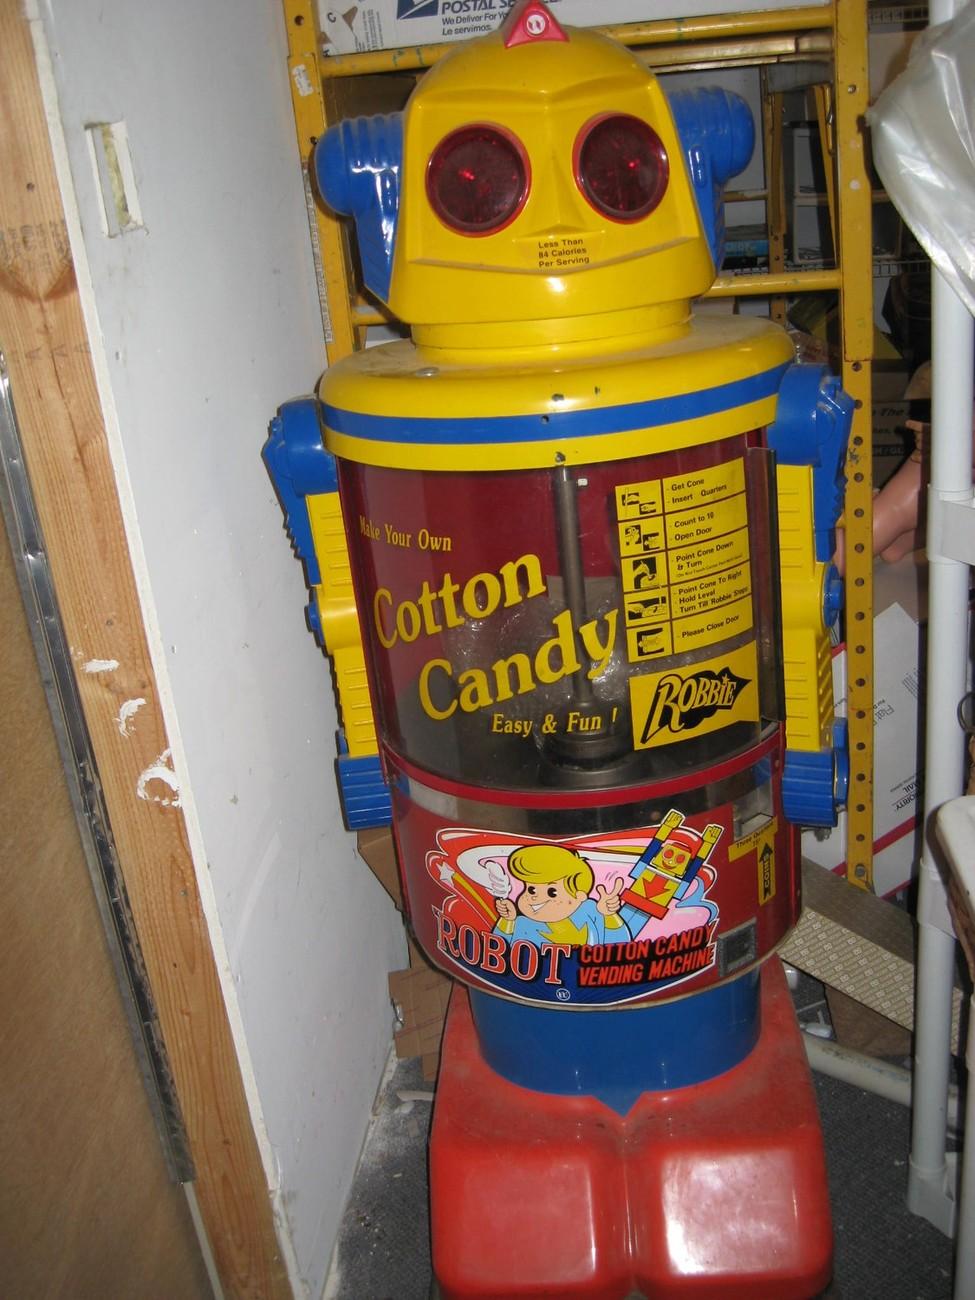 Related Pictures robot vending machine coca cola funny strange